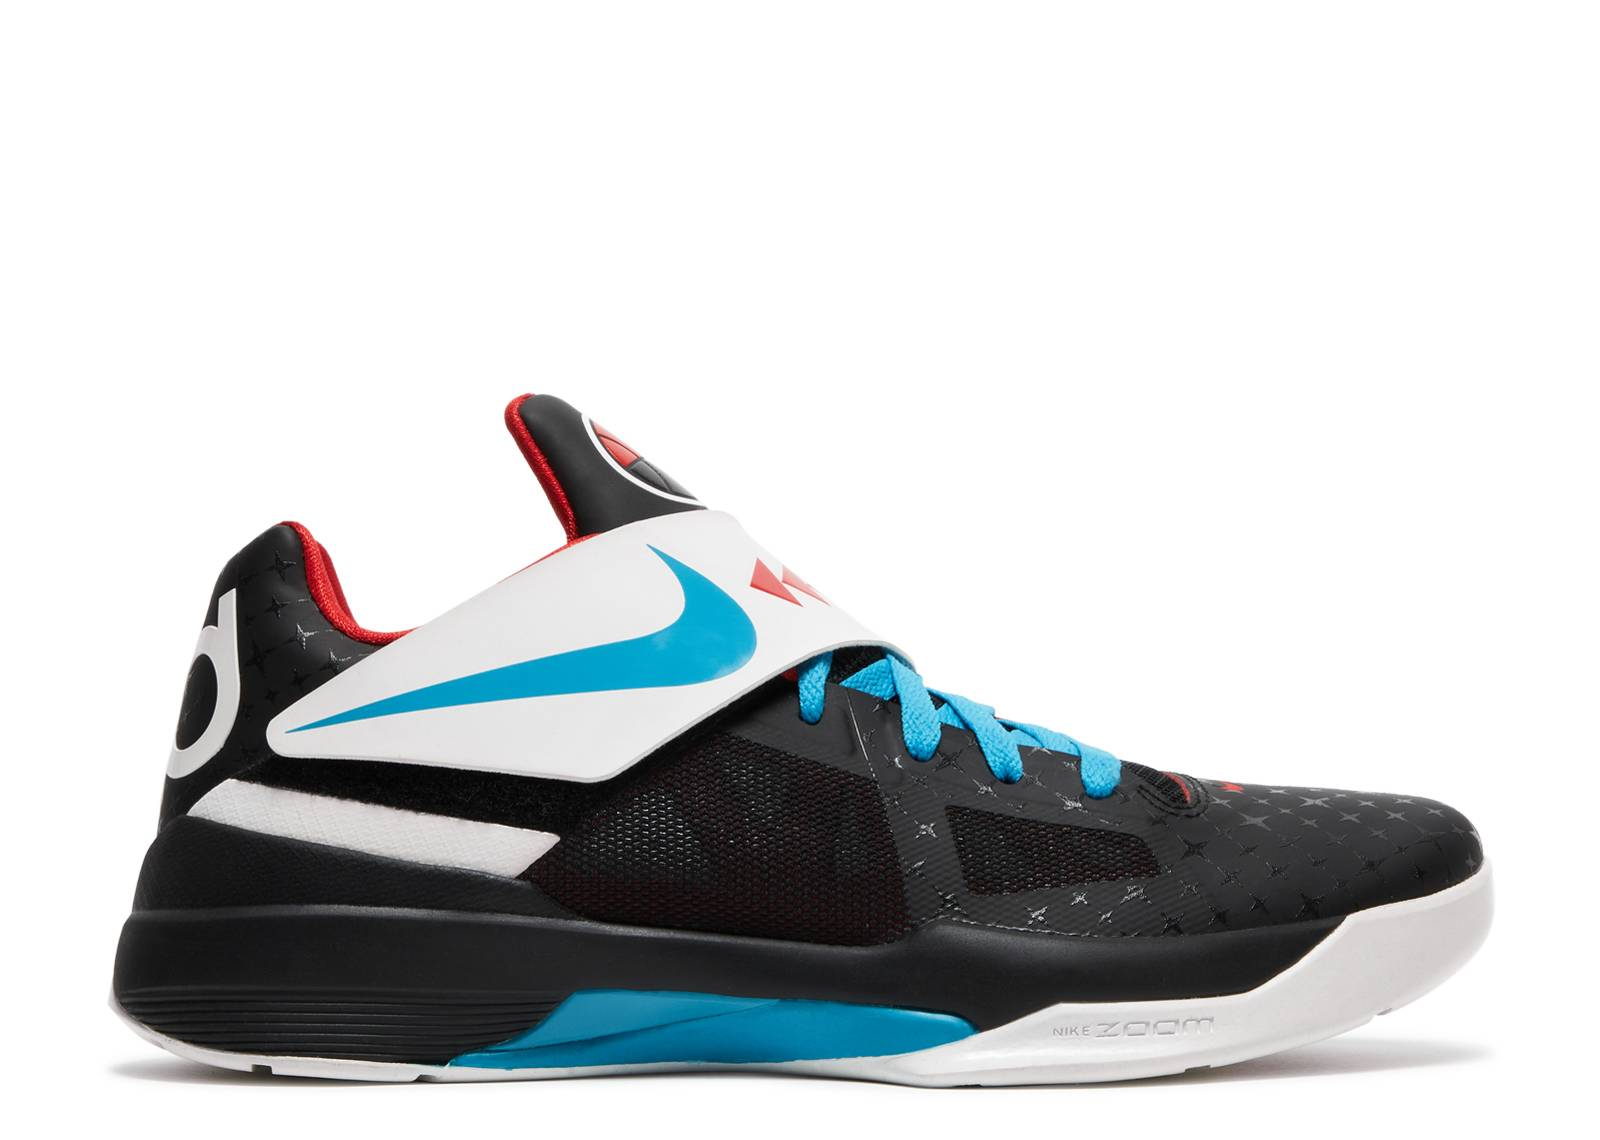 Air Max Volt Jaune Nike Zoom Hyperfuse Jaune Musée des